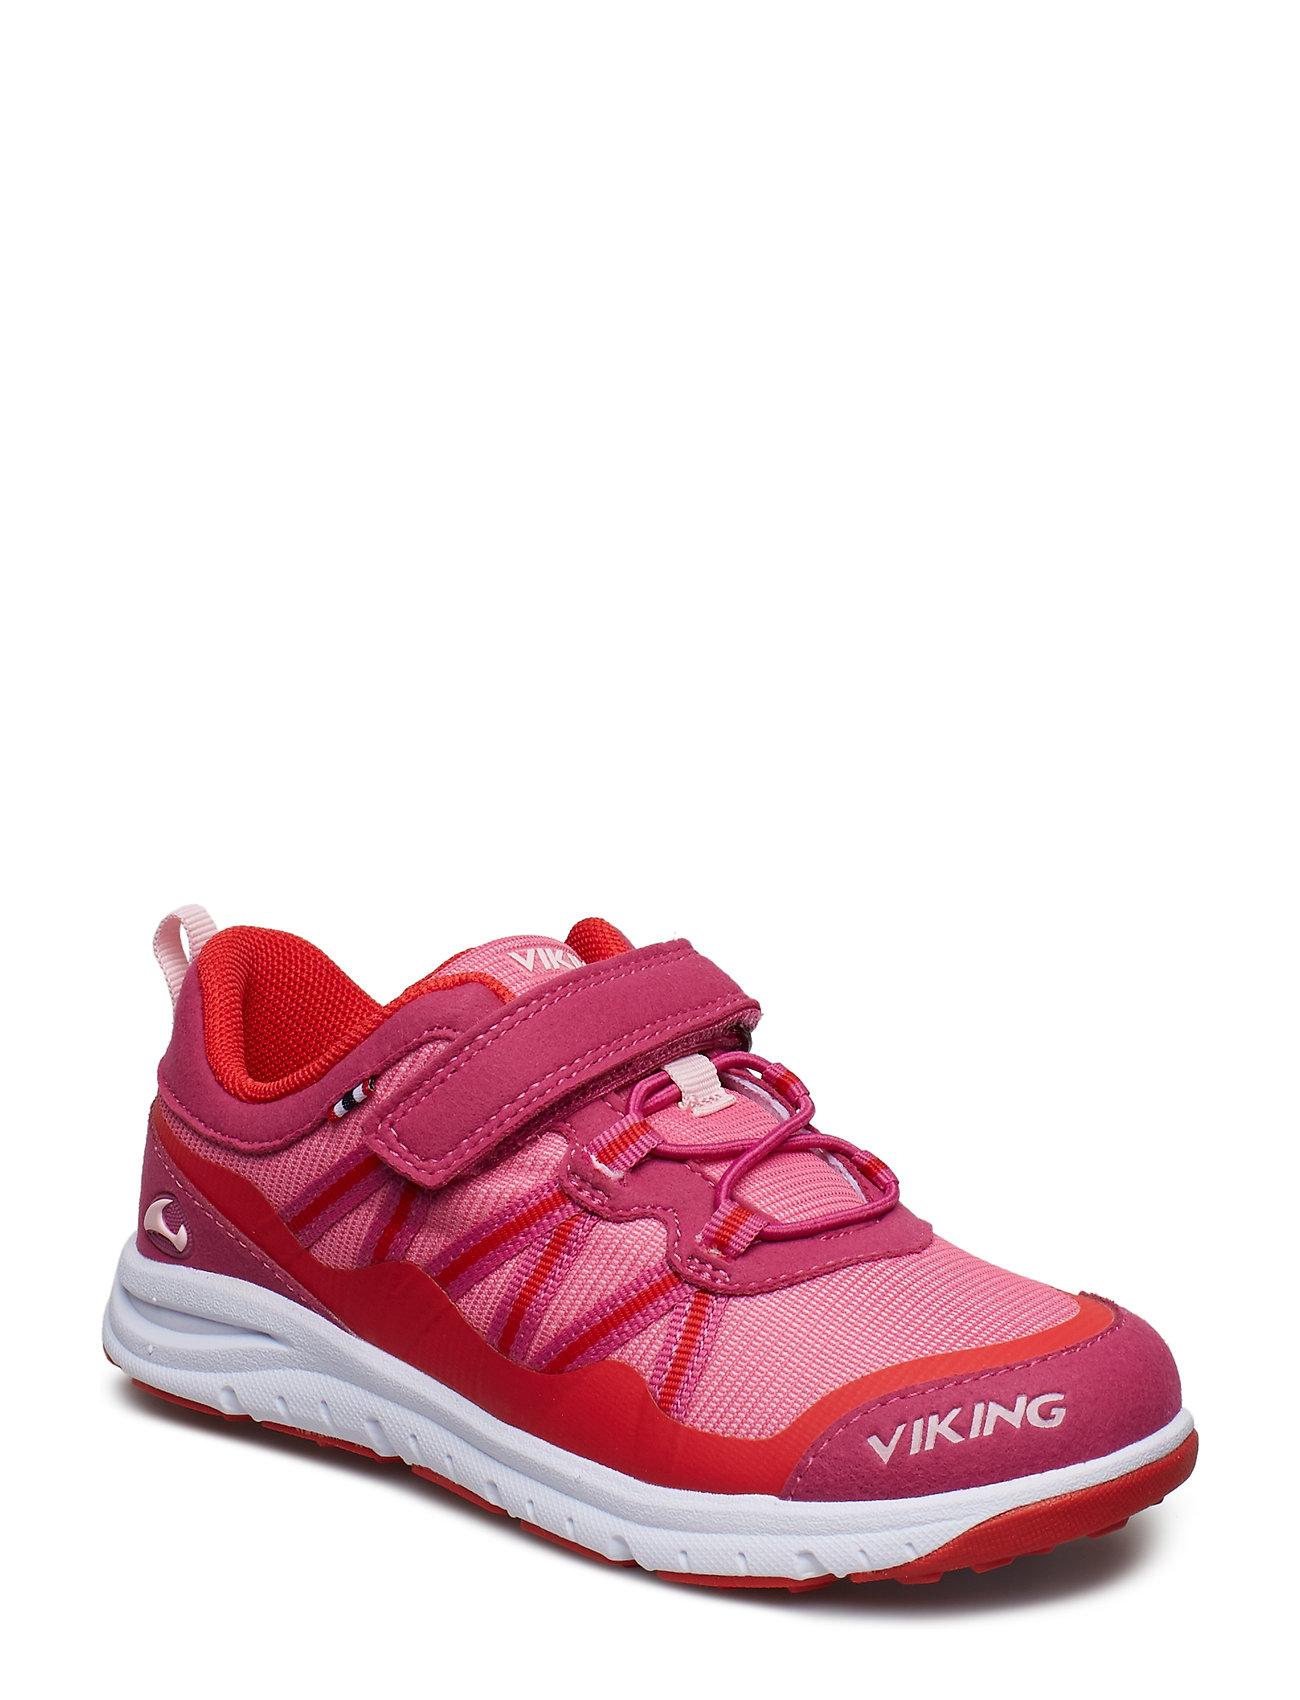 415a6dc792a Viking PÅ LAGER Skor online | upp till -60% | SPOT-A-SHOP